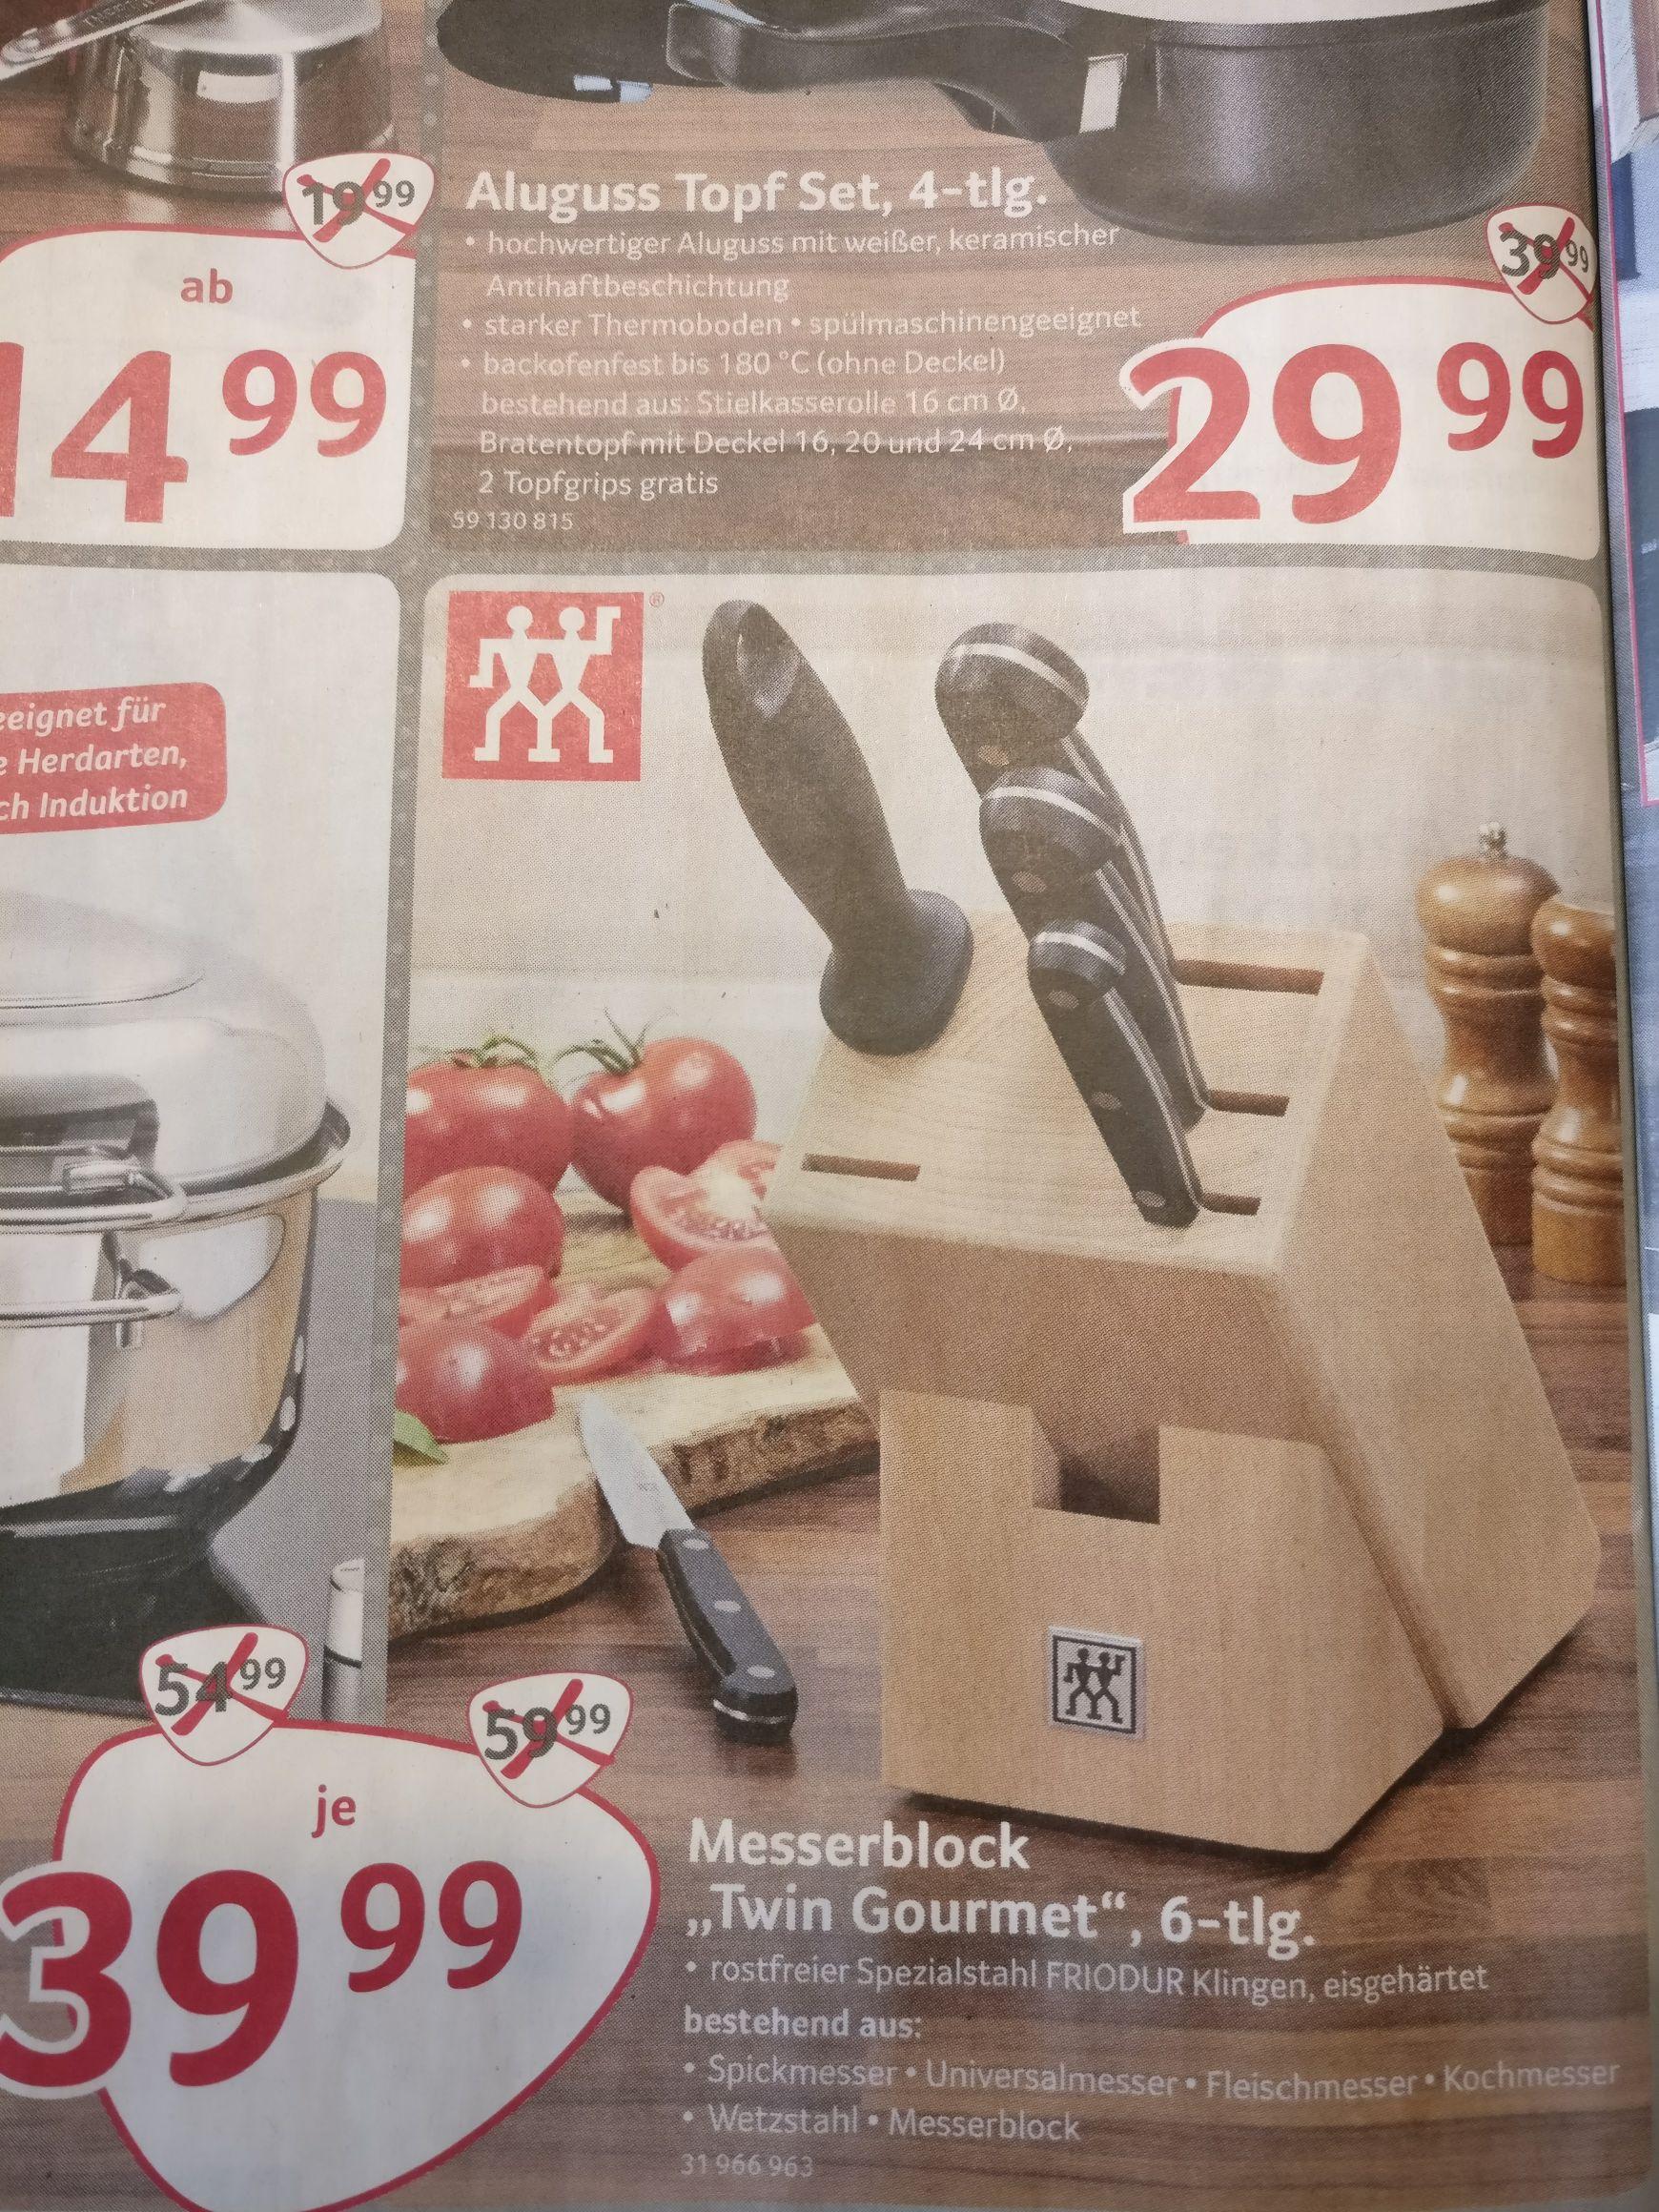 [Selgros - Offline] Zwilling Twin Gourmet Messerblock 6tlg - 30€ unter PVG